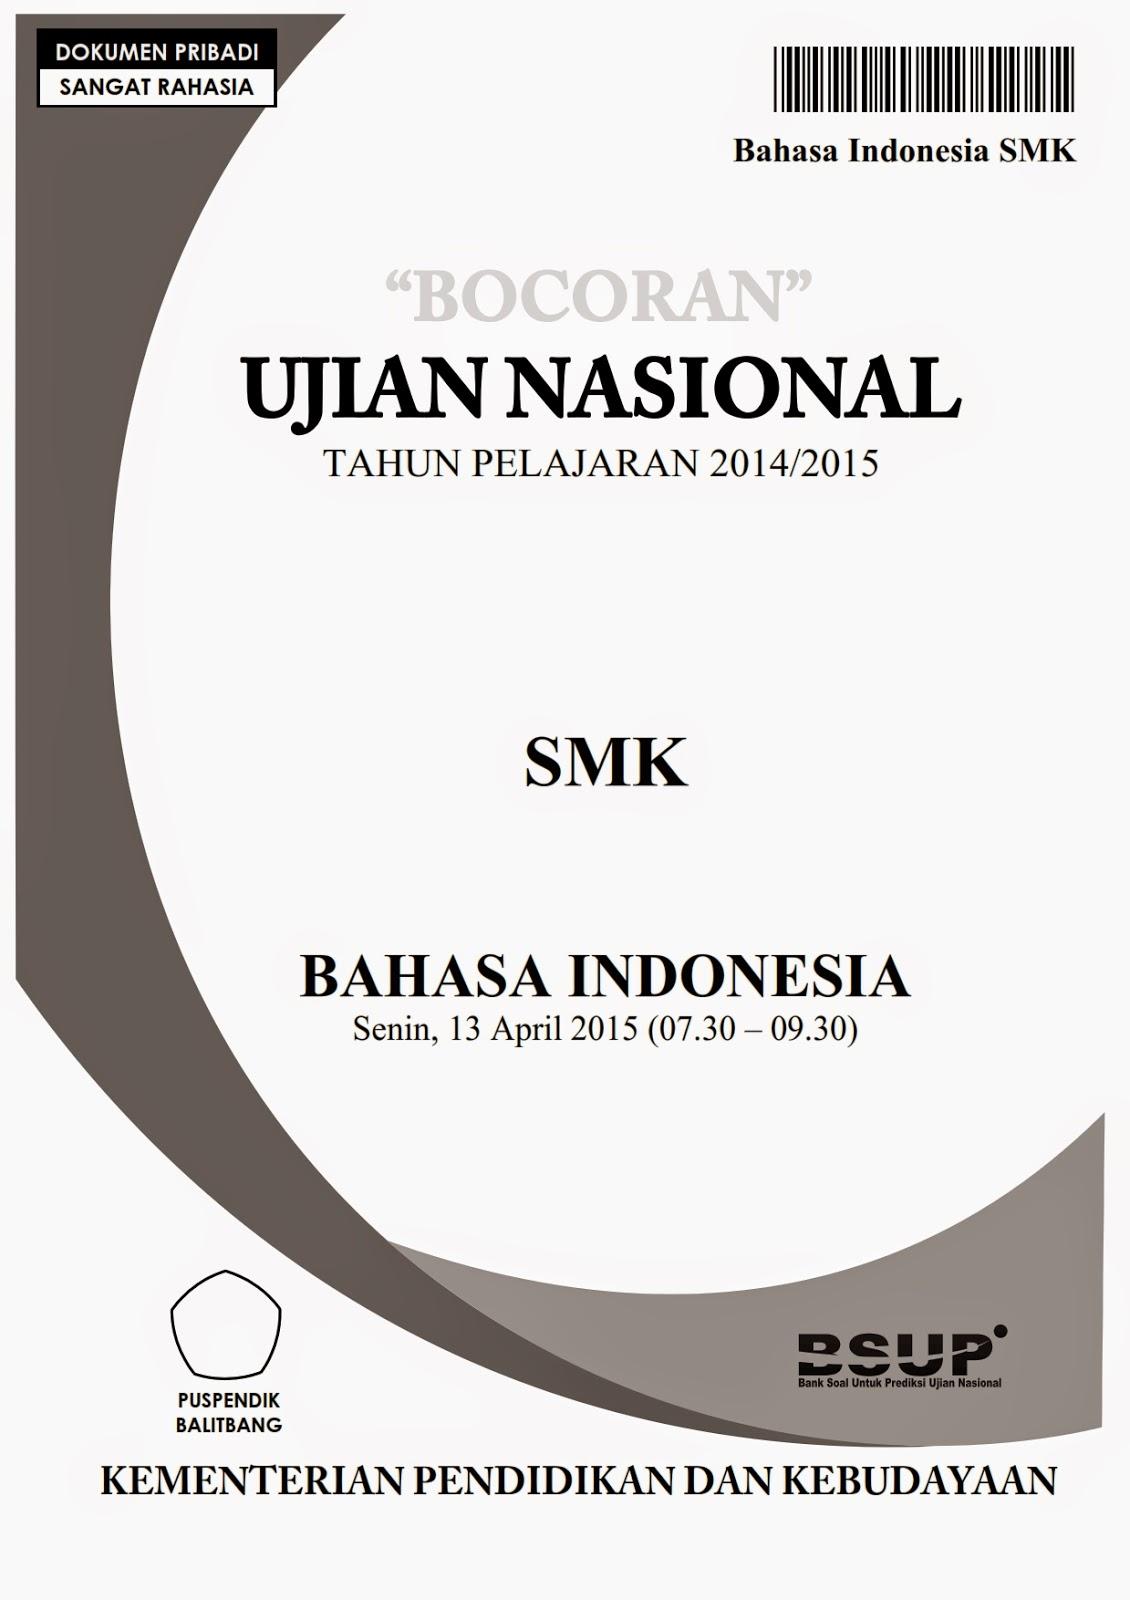 Bocoran Soal Un Bahasa Indonesia Smk 2015